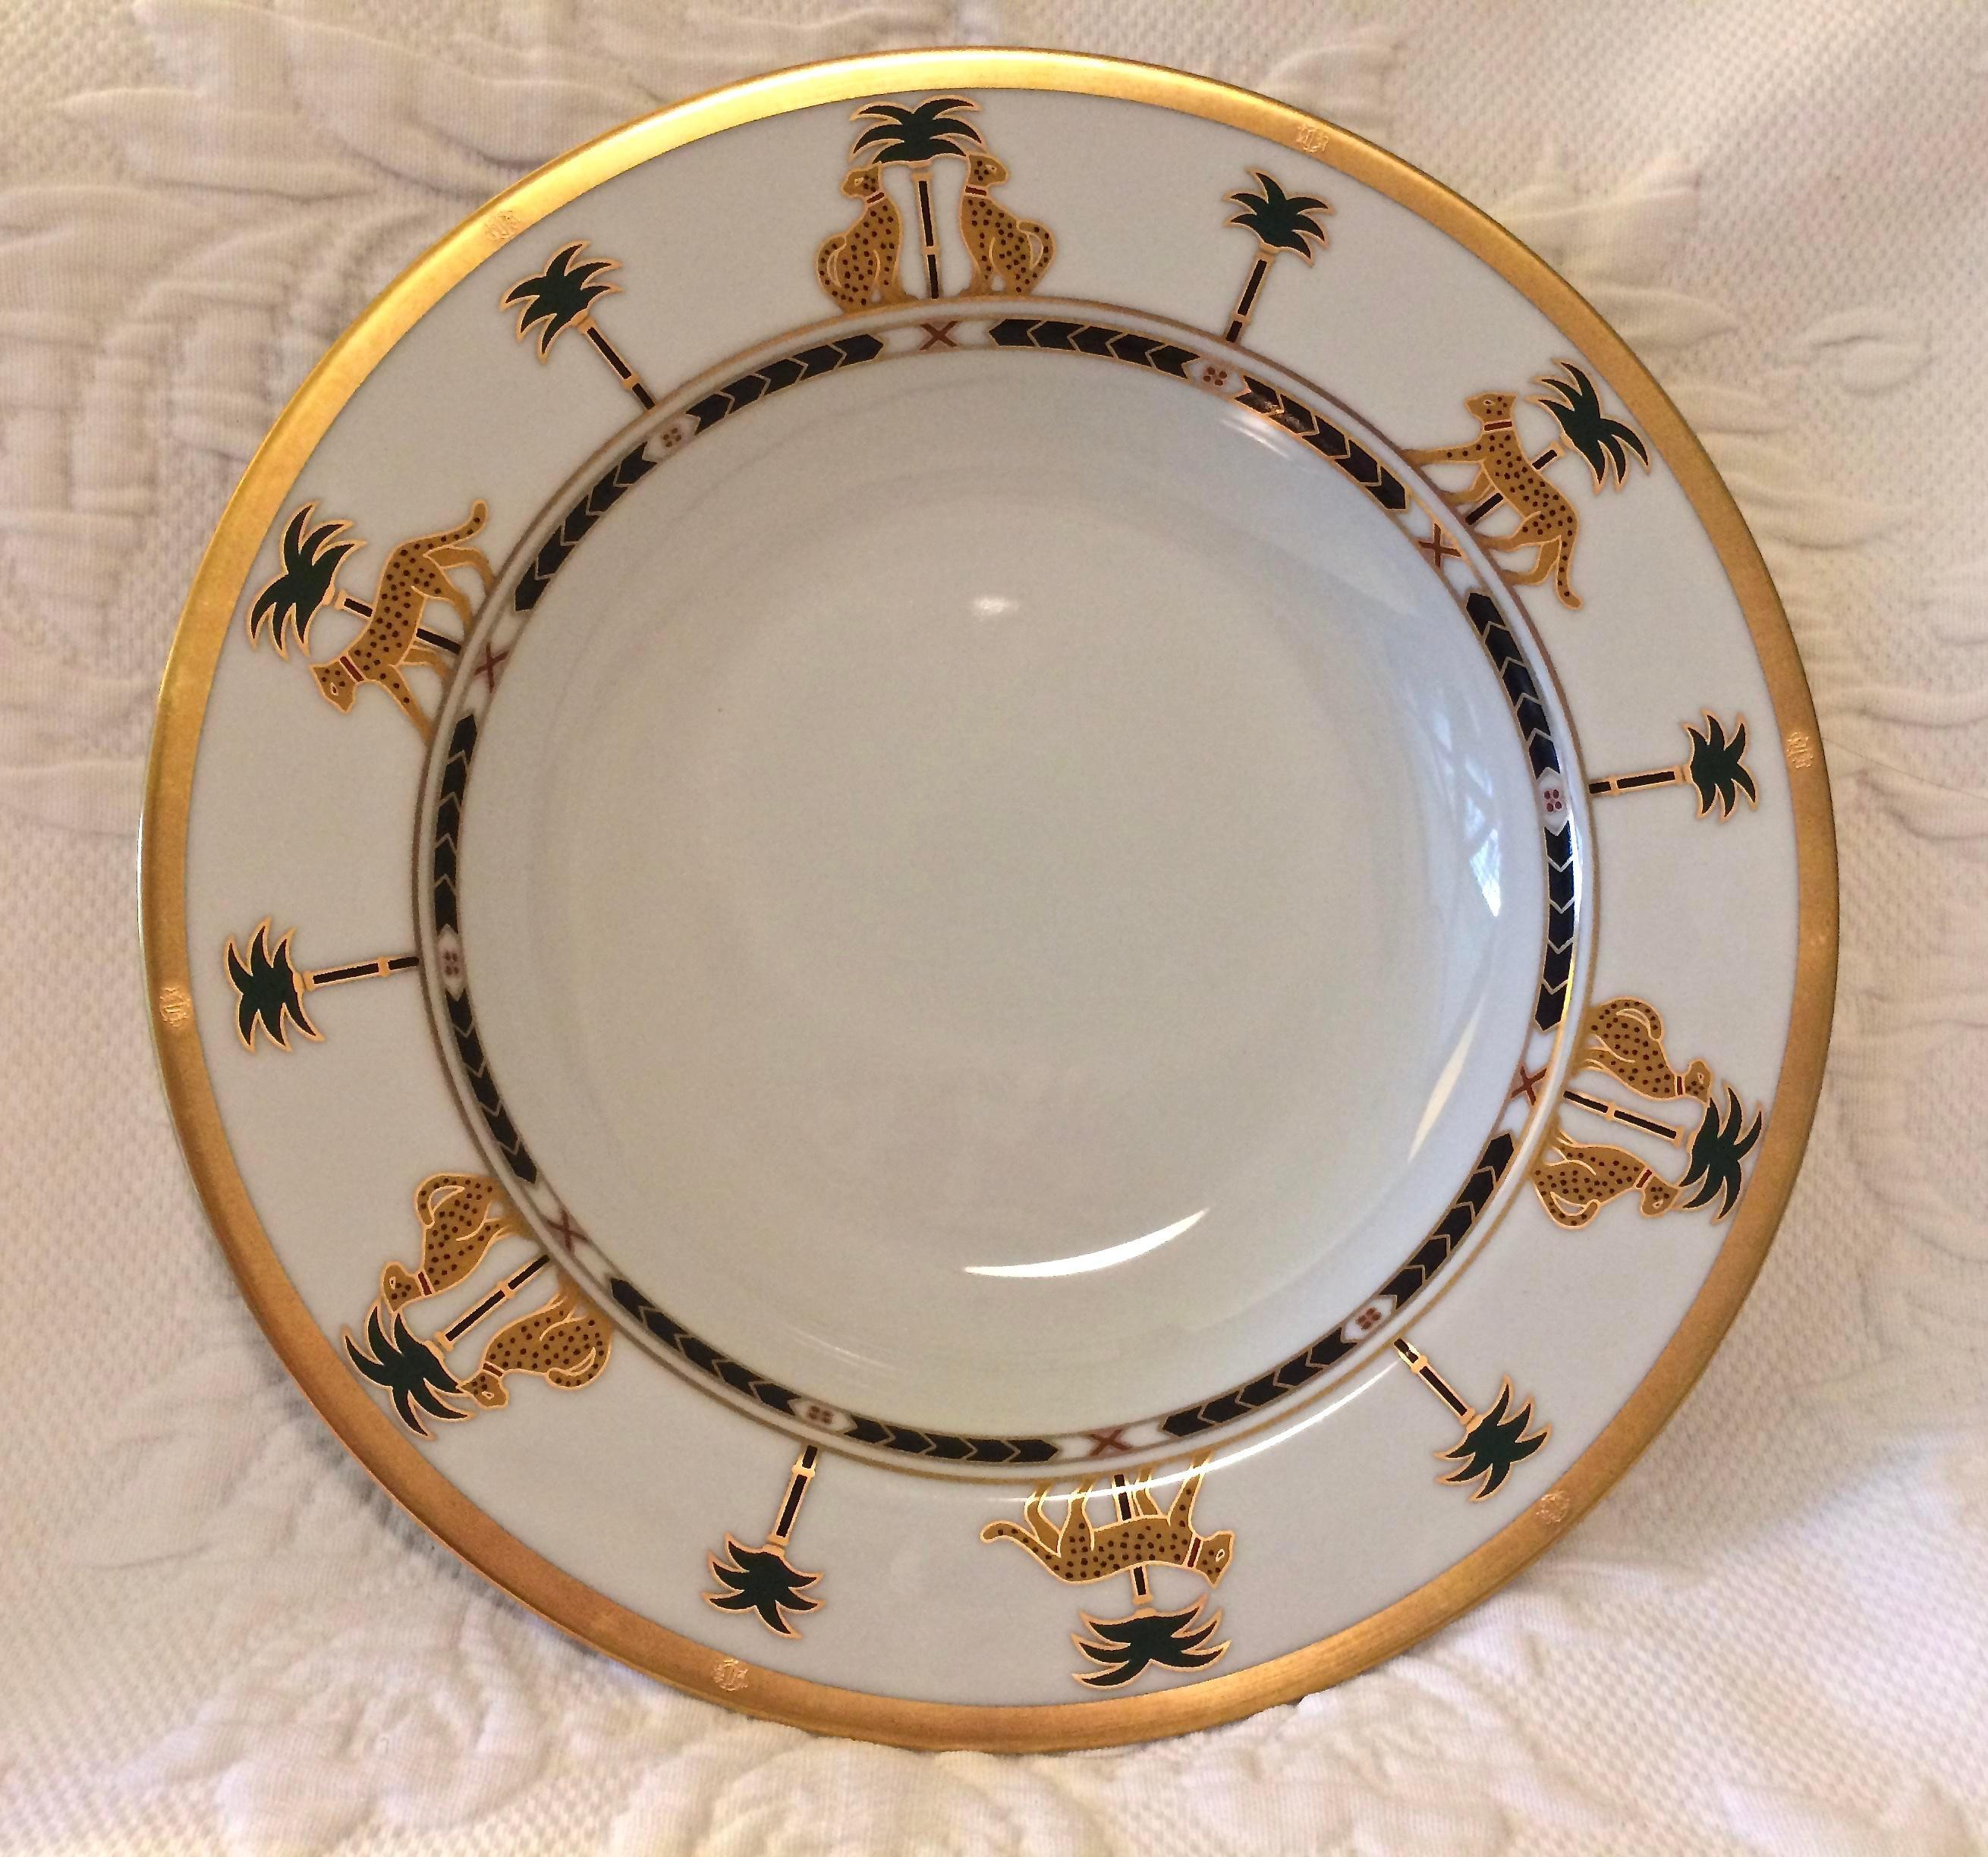 Christian Dior Hollywood Glamour  Casablanca  Fine China Bowls - Set of 6 - Image & Christian Dior Hollywood Glamour